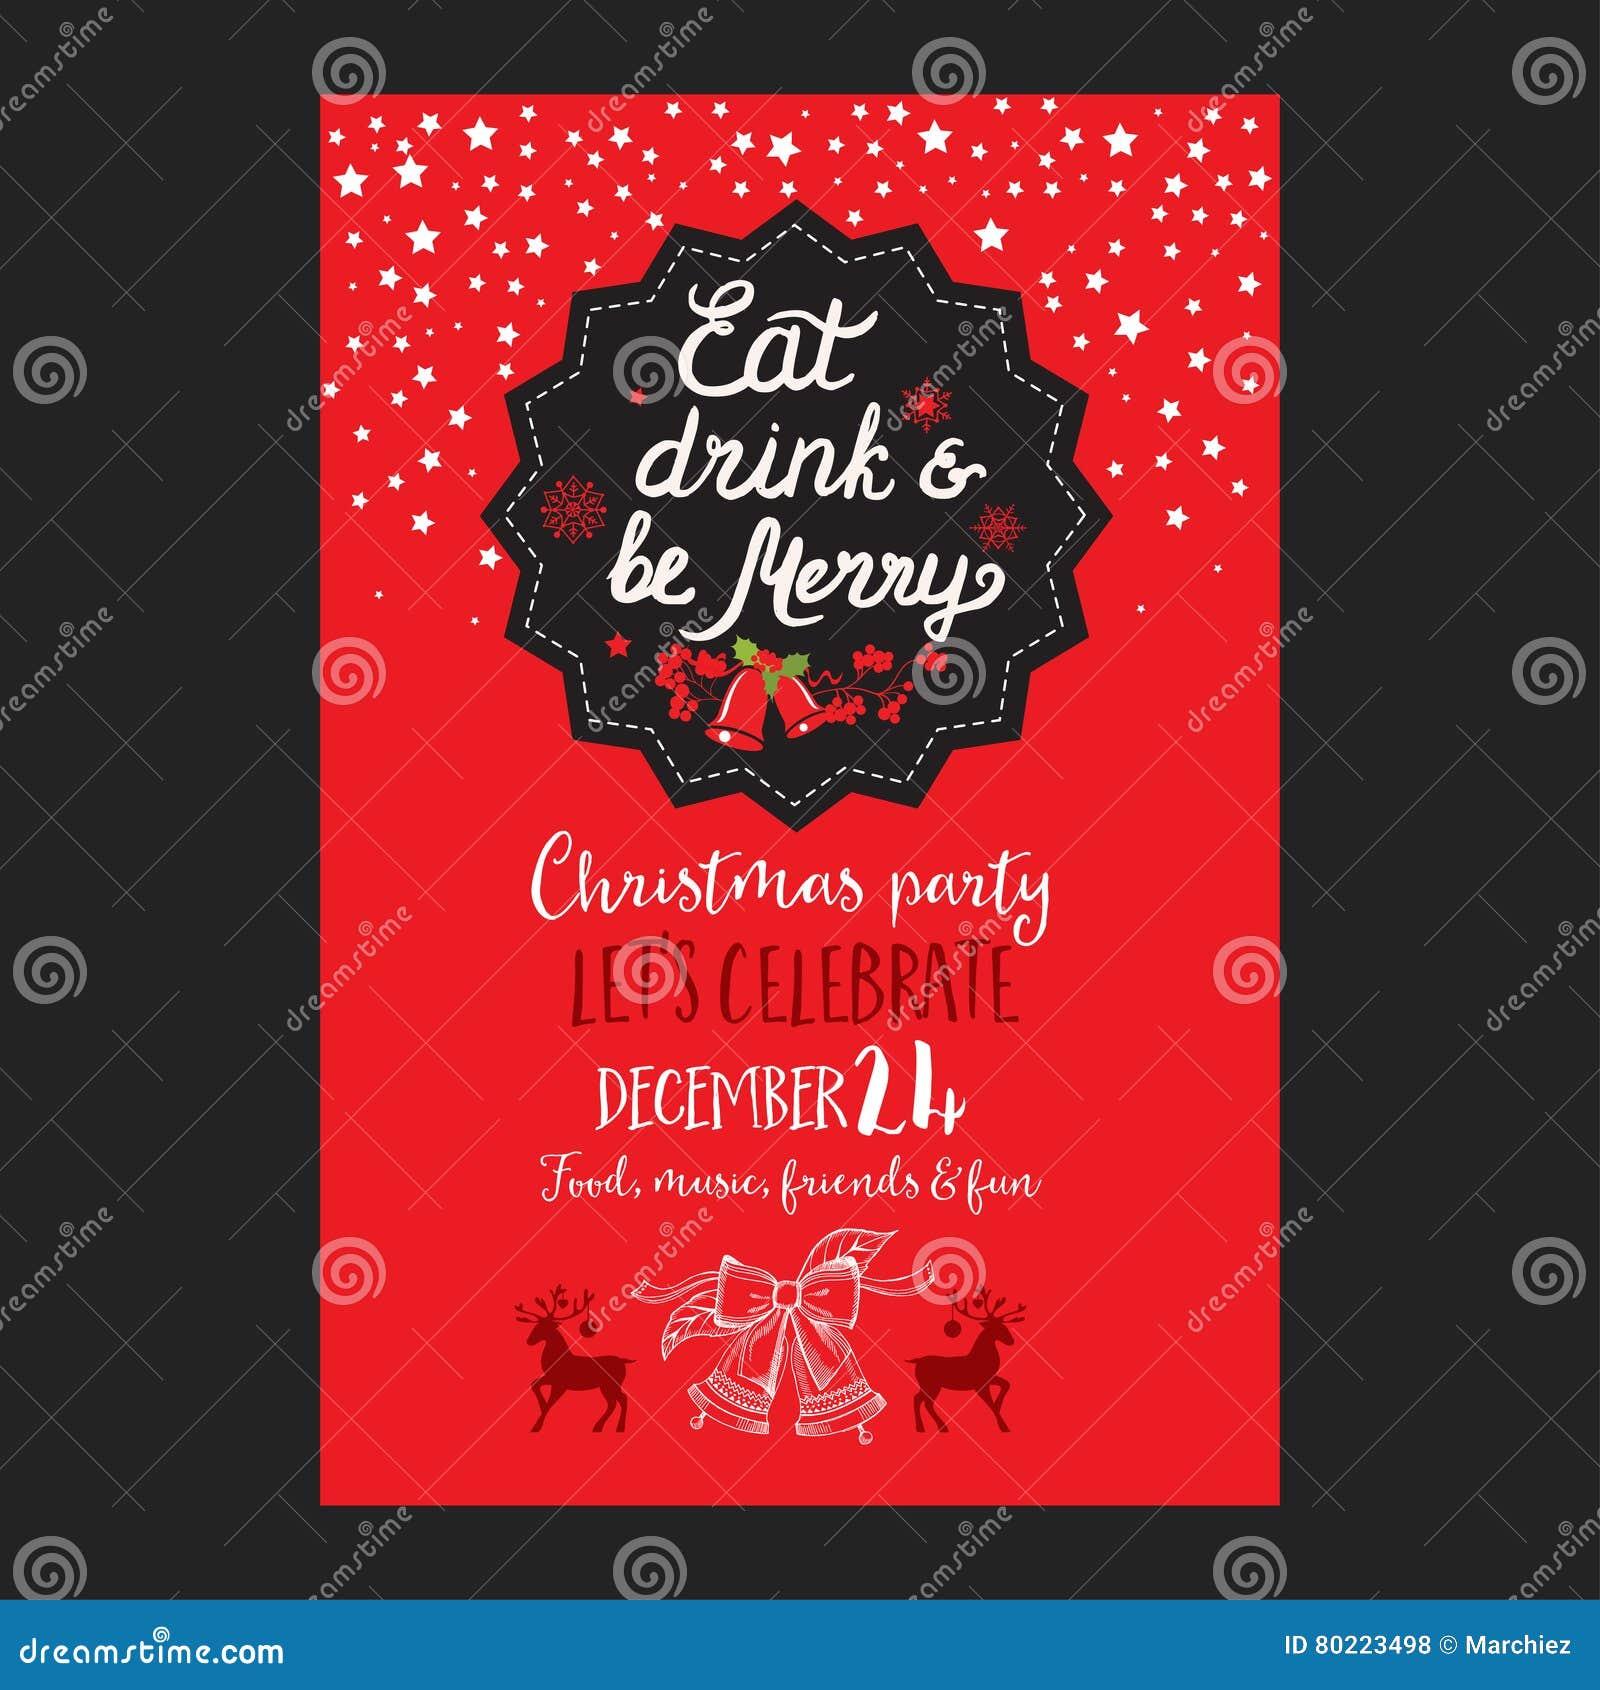 Christmas Party Invitation, Food Menu Restaurant. Stock Vector ...